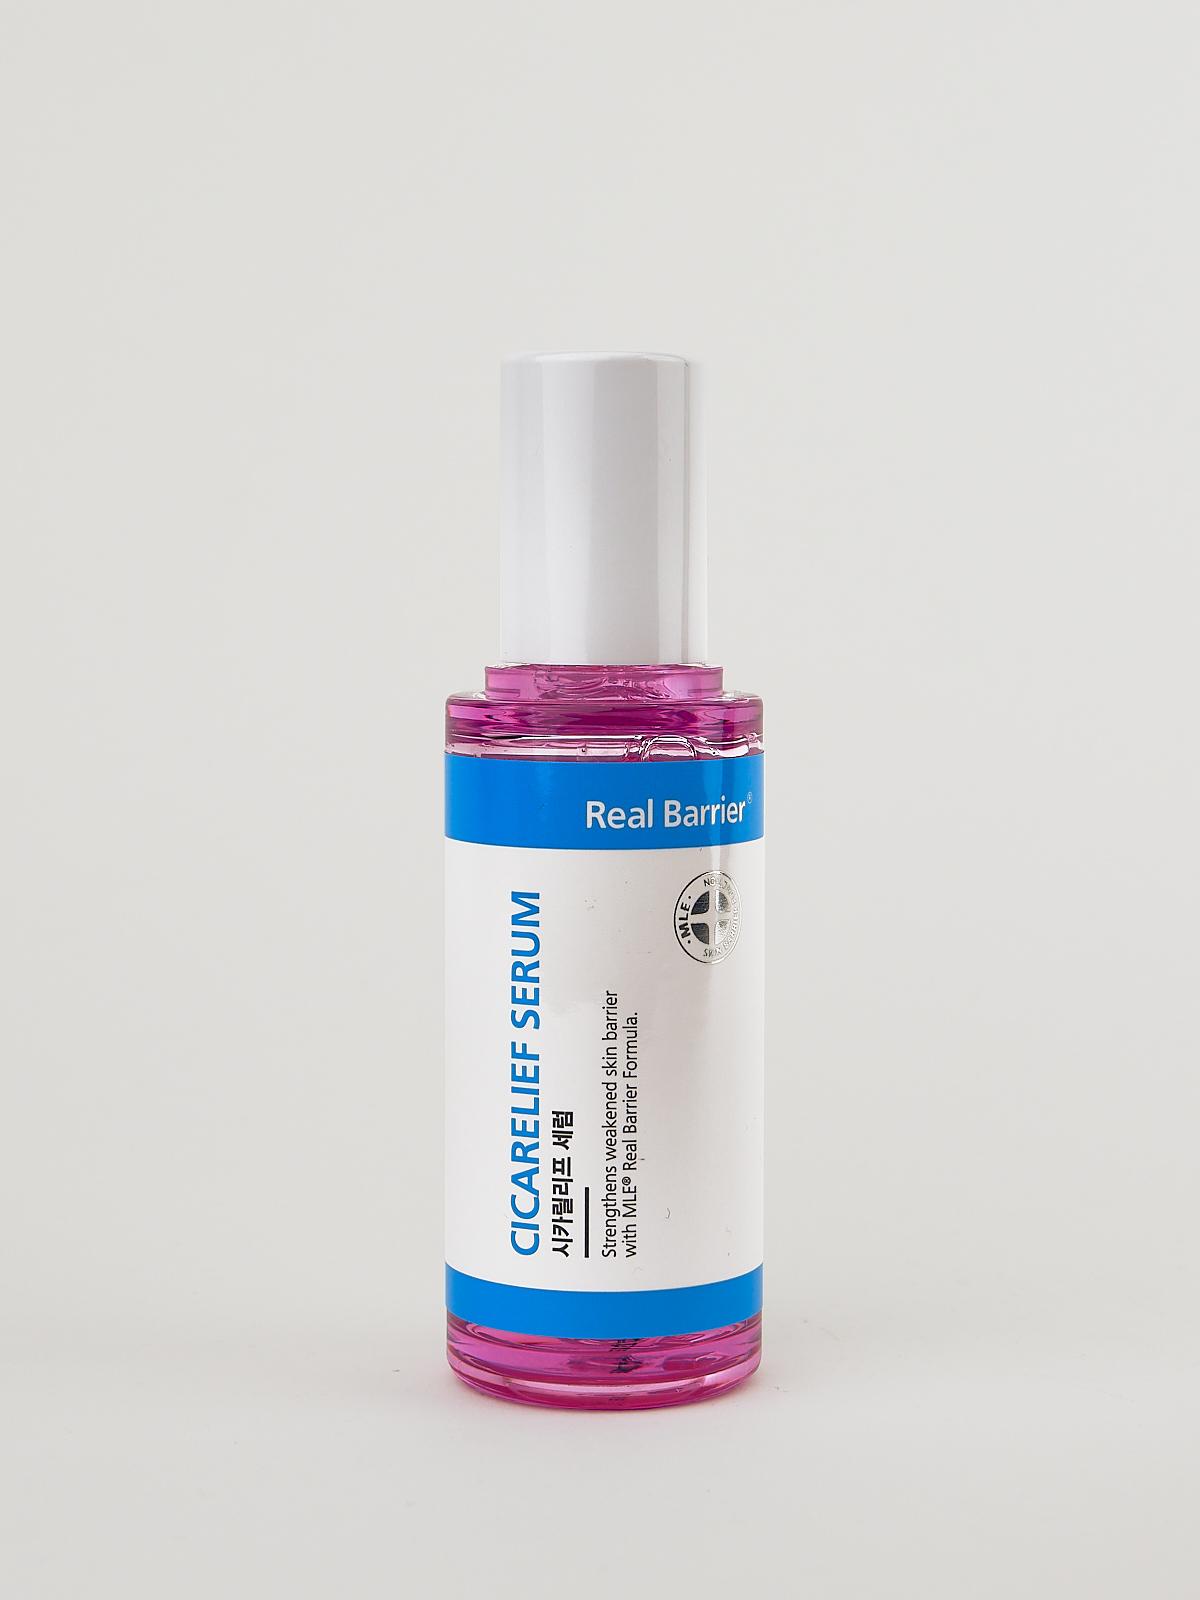 Real Barrier Cicarelief Serum in rosaner Flasche